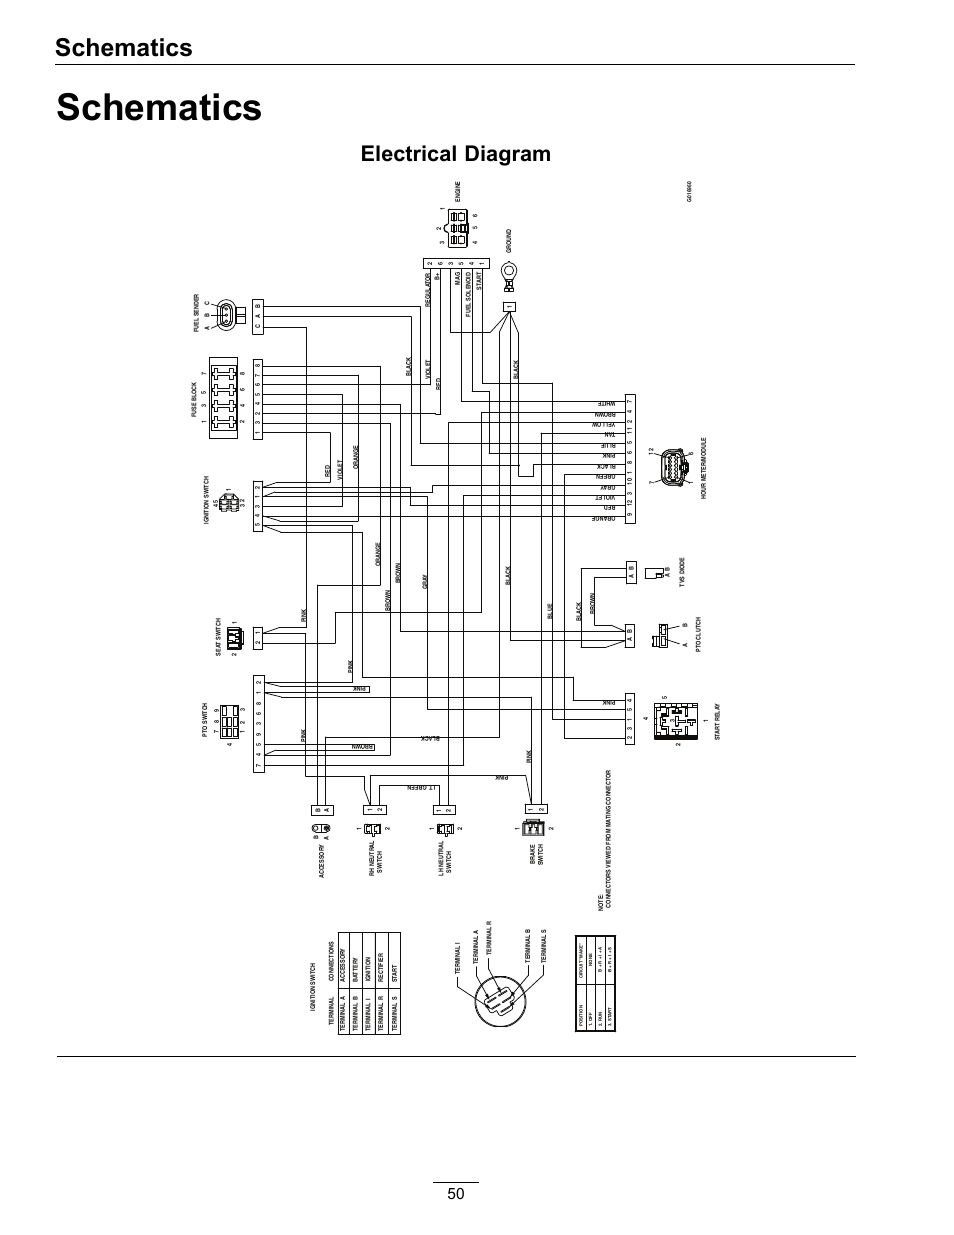 981 Jeep Cj7 Engine Diagram